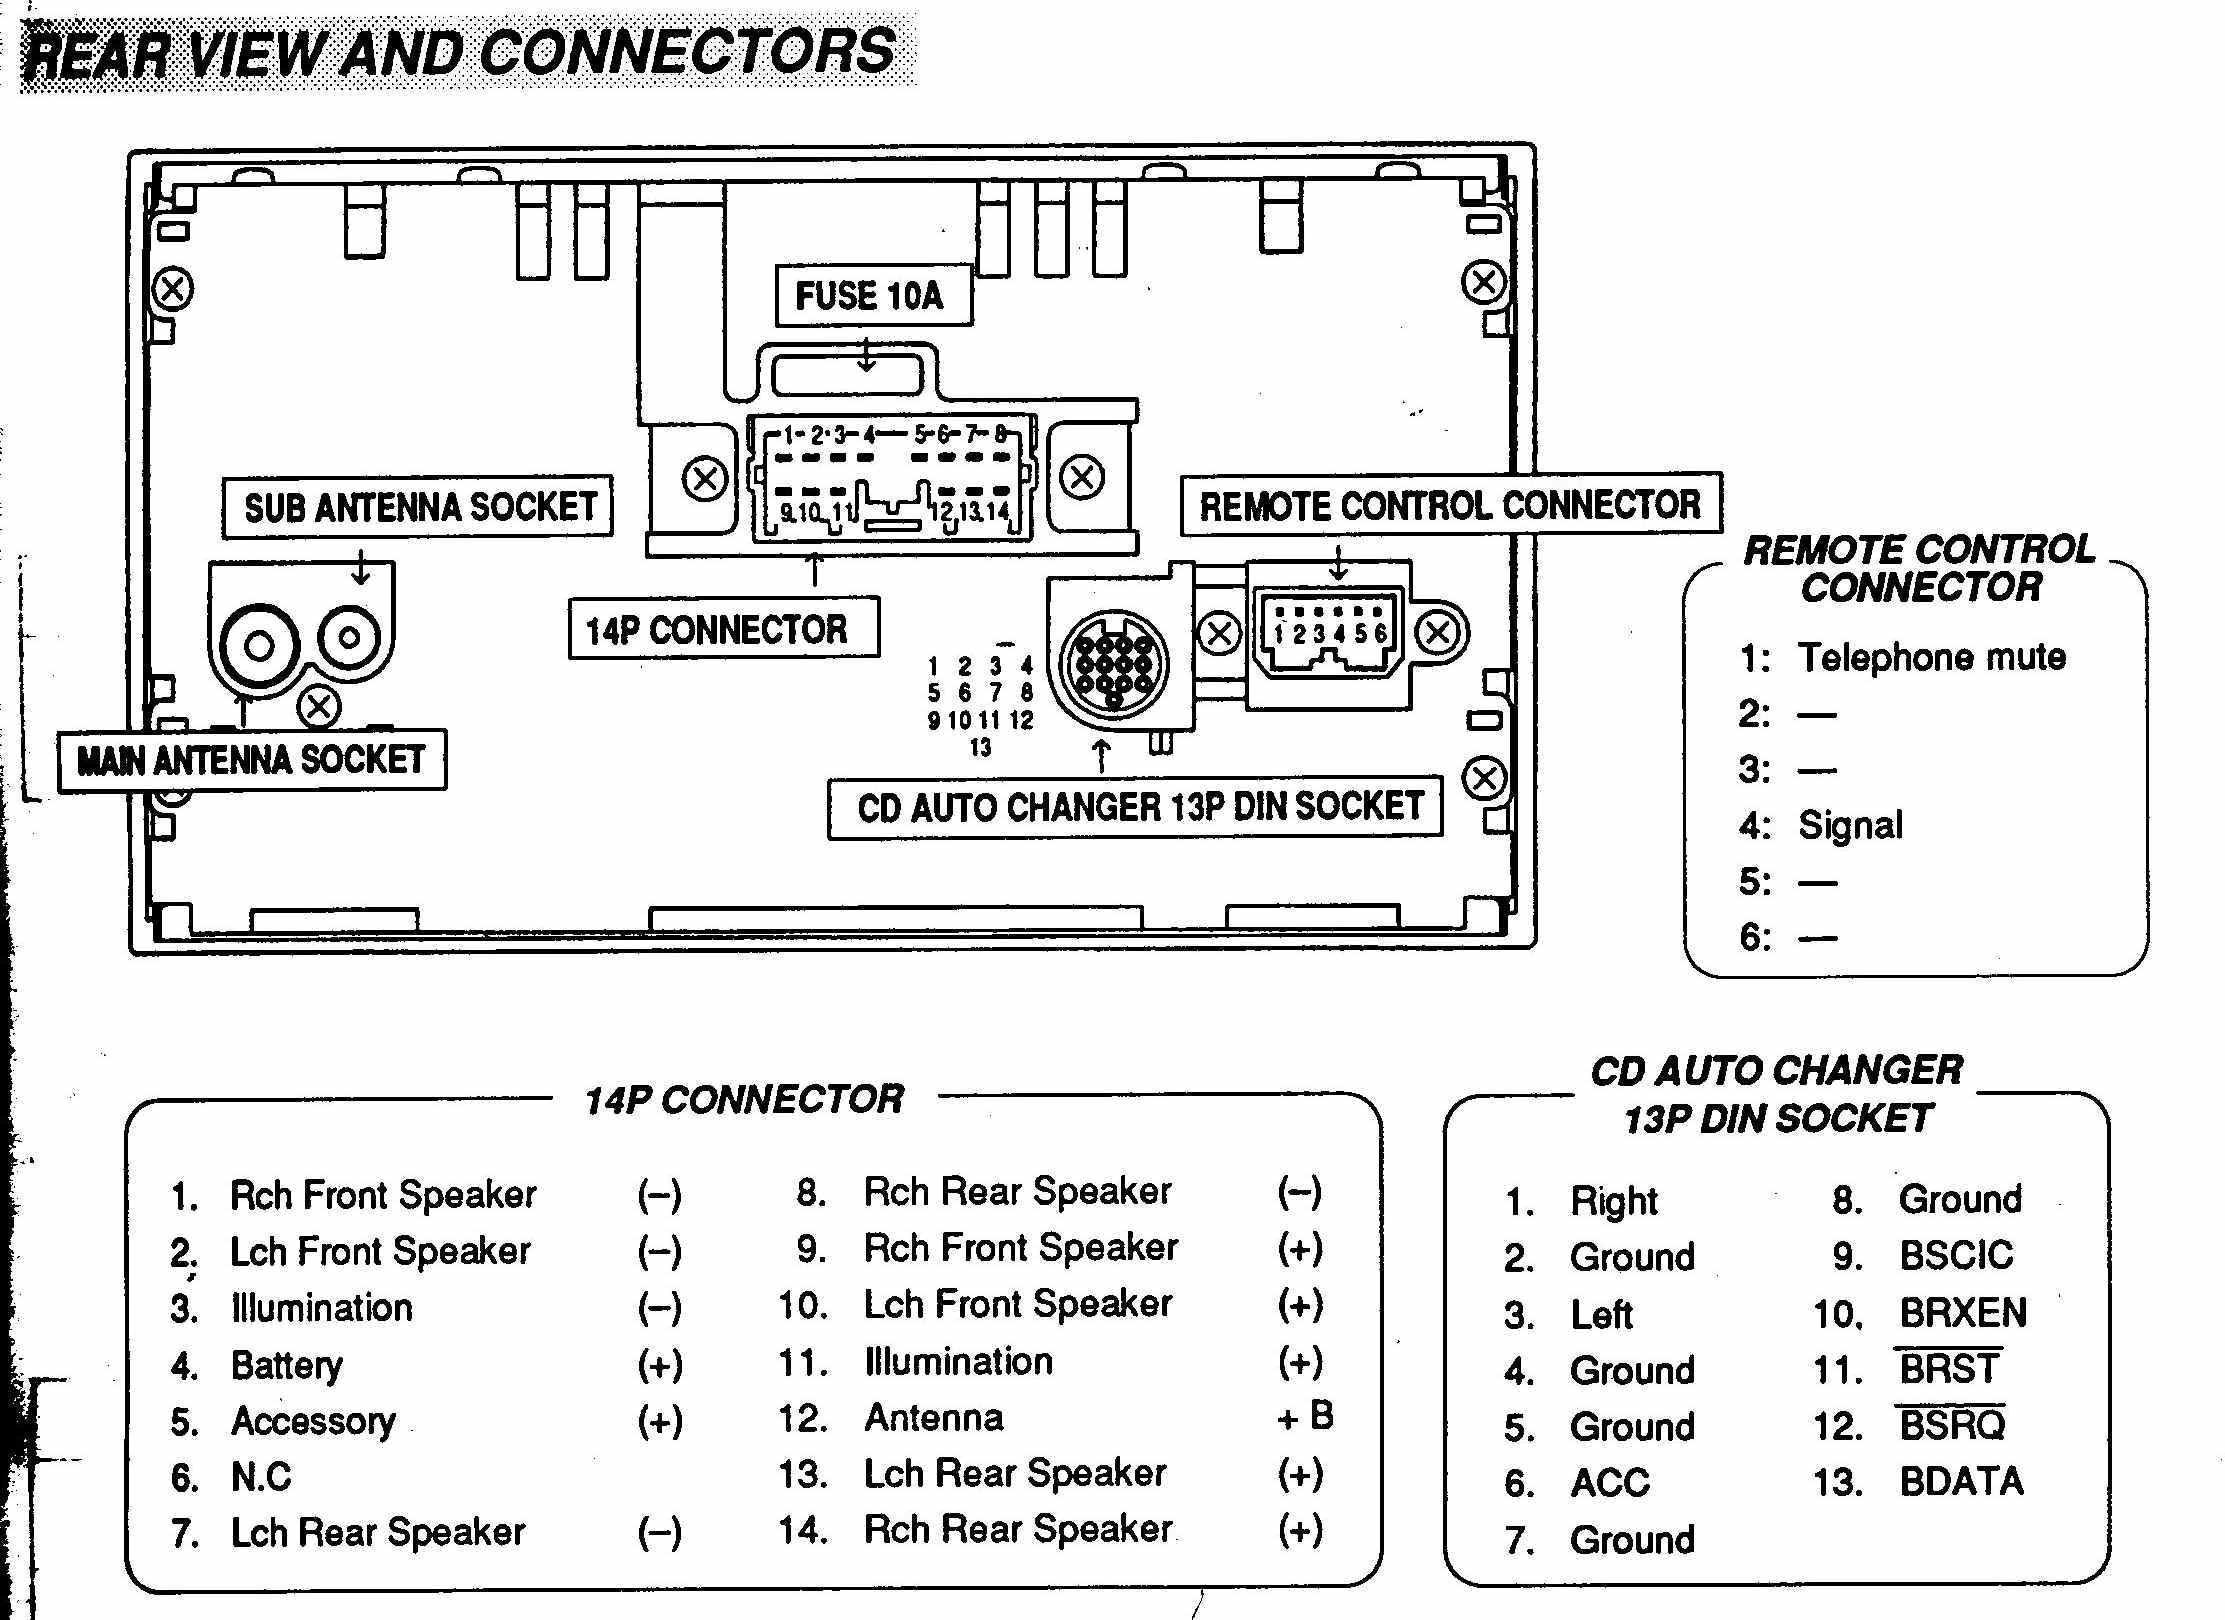 Bose Car Stereo Wiring Diagram Car Audio Wiring Diagrams Nissan Trail Radio Diagram Wire Codes Of Bose Car Stereo Wiring Diagram